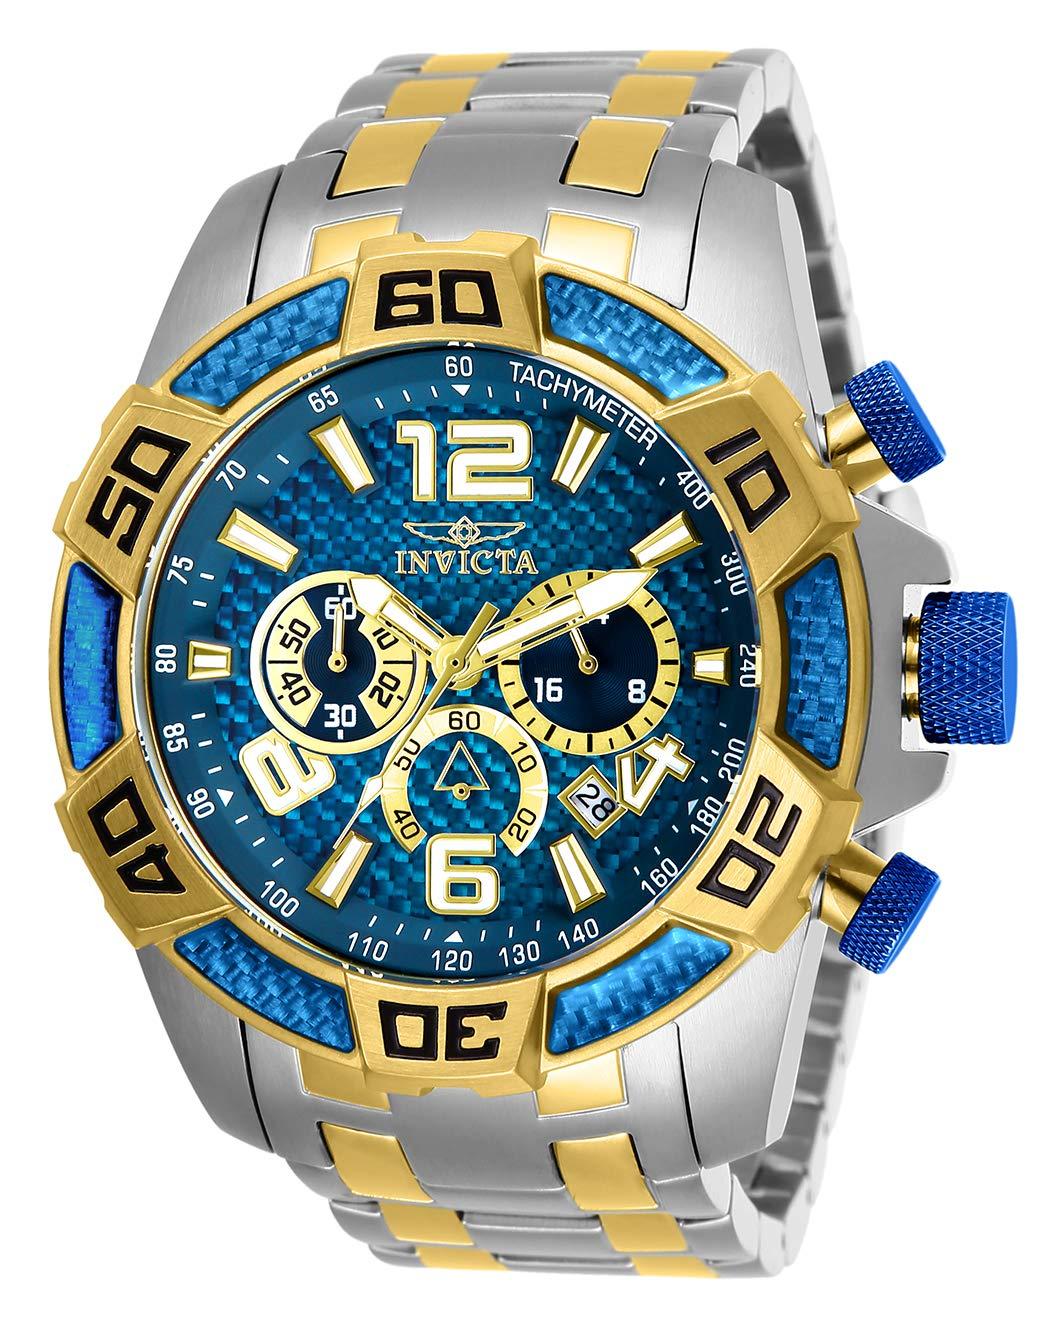 Invicta-Pro-Diver-Herren-Armbanduhr-Armband-Edelstahl-Gehuse-Quarz-25855